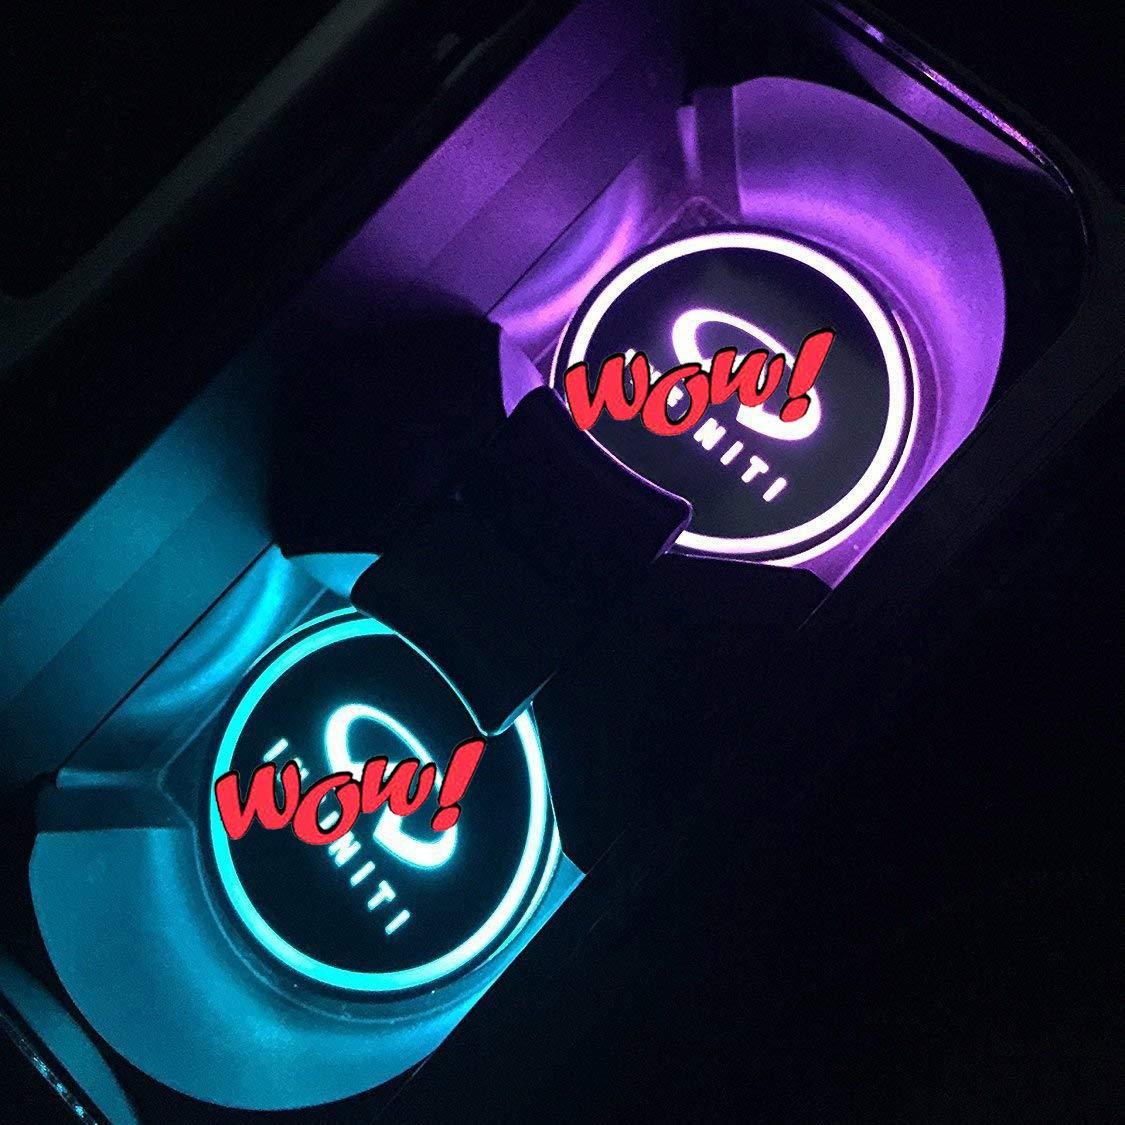 KINBEAR Impermeable Posavasos Coche Luces led 7 Colores de Carga USB Sostenedor de la Bebida para el Coche Accesorios LED Interiores luz Mercedes Amg